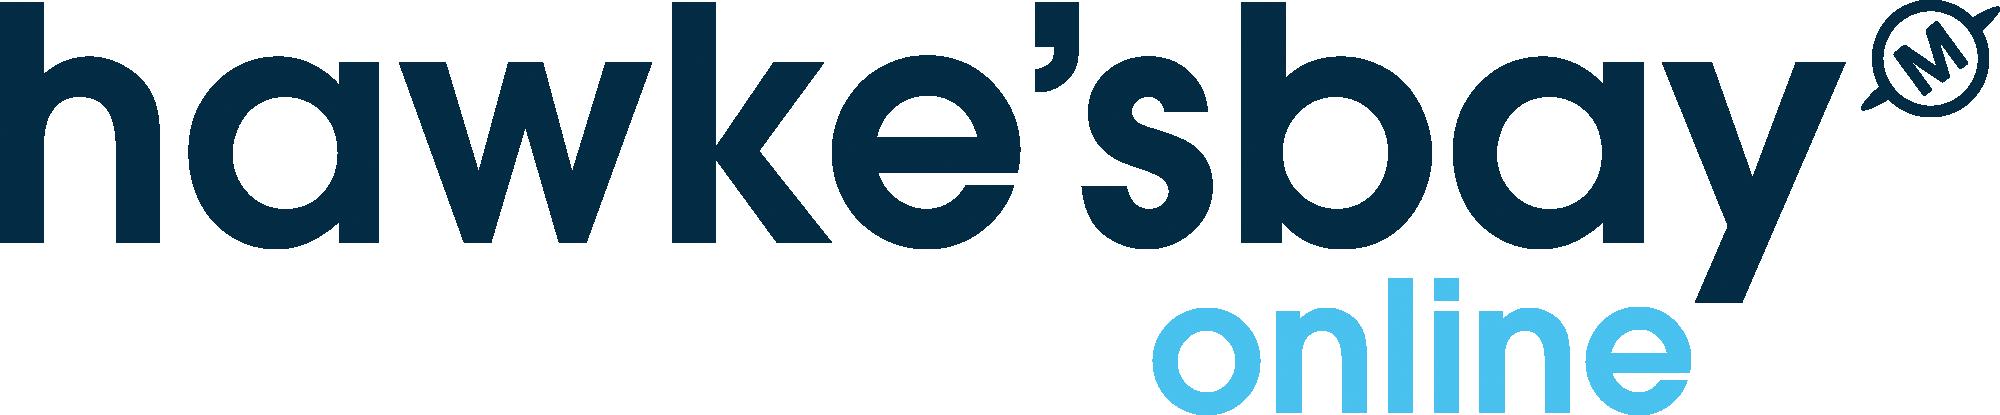 Hawke's Bay Mall Logo